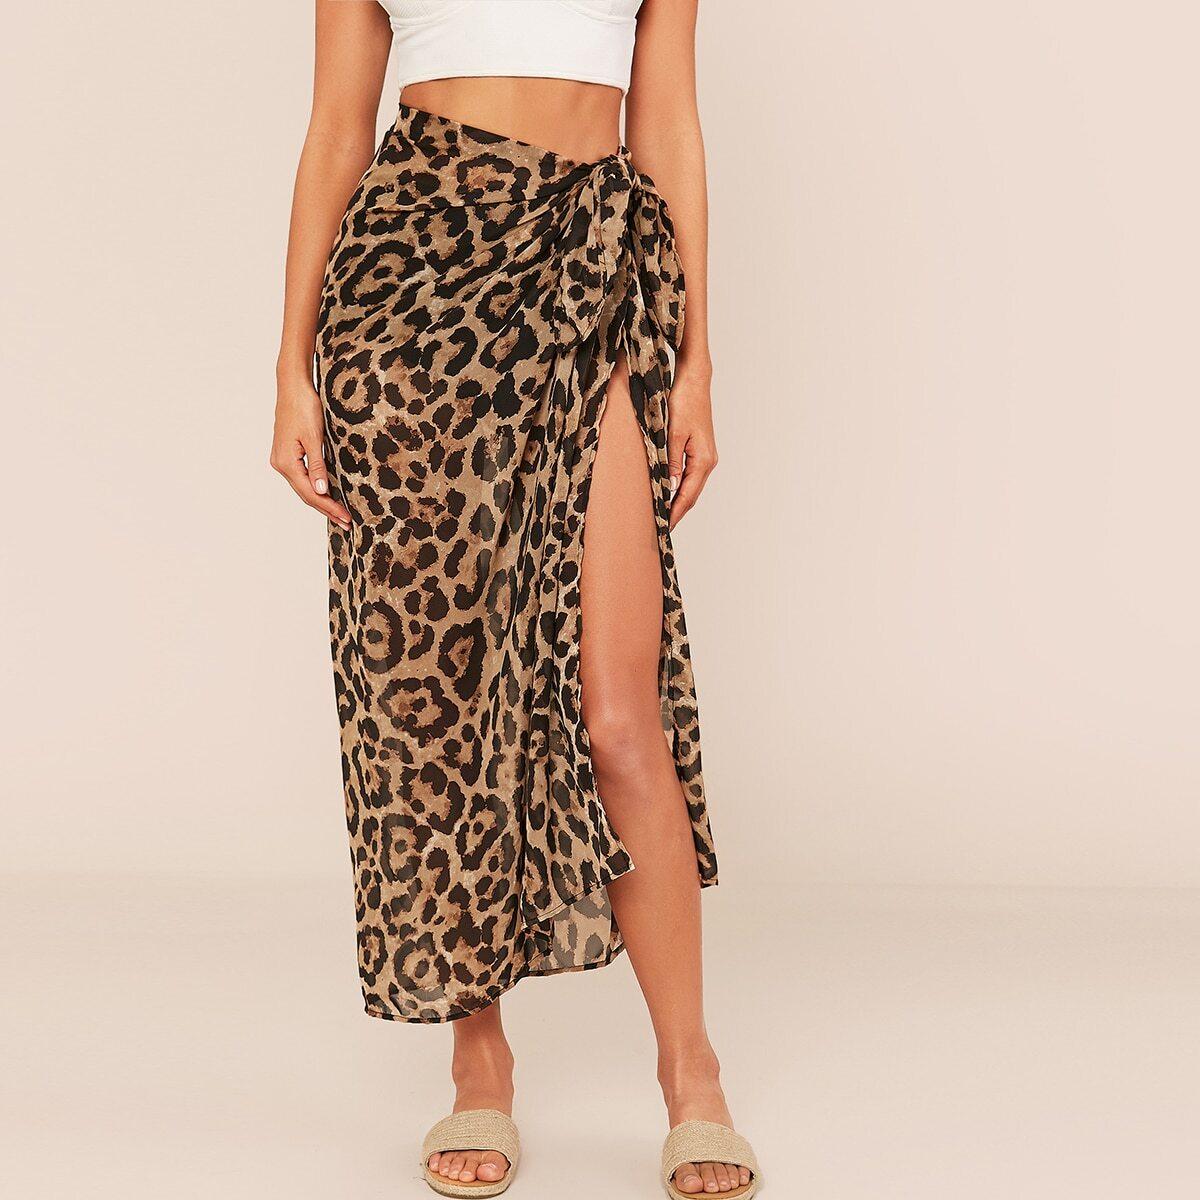 Split Thigh Tie Side Leopard Skirt, SHEIN  - buy with discount